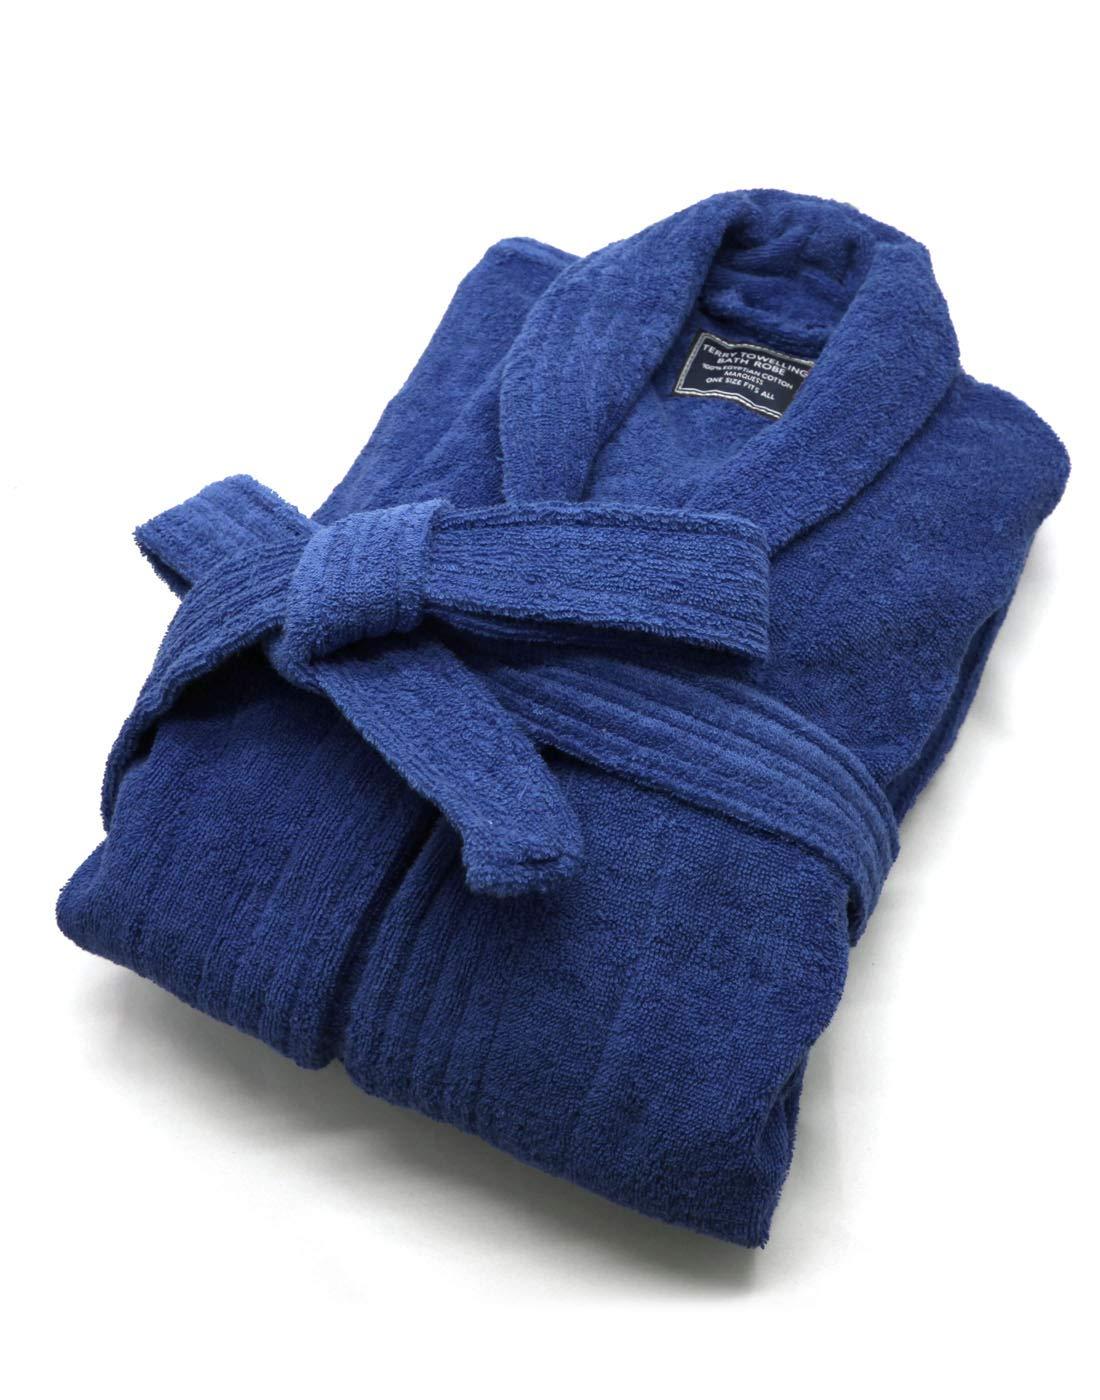 100% Cotton Terry Bath Robe,Men and Women, Soft & Warm Fleece Home Bathrobe, Sleepwear Loungewear Robe, One Size Fits All (Navy Blue)